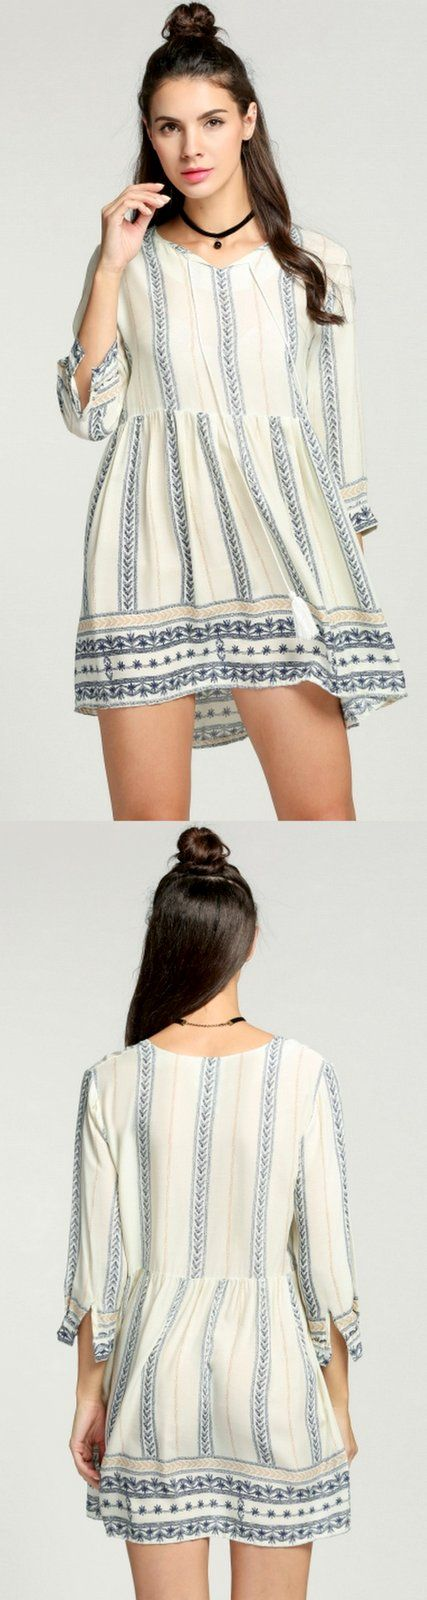 Product Description: Summer Casual Women O-Neck 3/4 Sleeve Print Beach Smock Dress. Material: Cotton Blend, Color: Beige, Design: Smock Dress, Season: Summer, Autumn, Collar: O-Neck, Sleeve: 3/4 Sleev